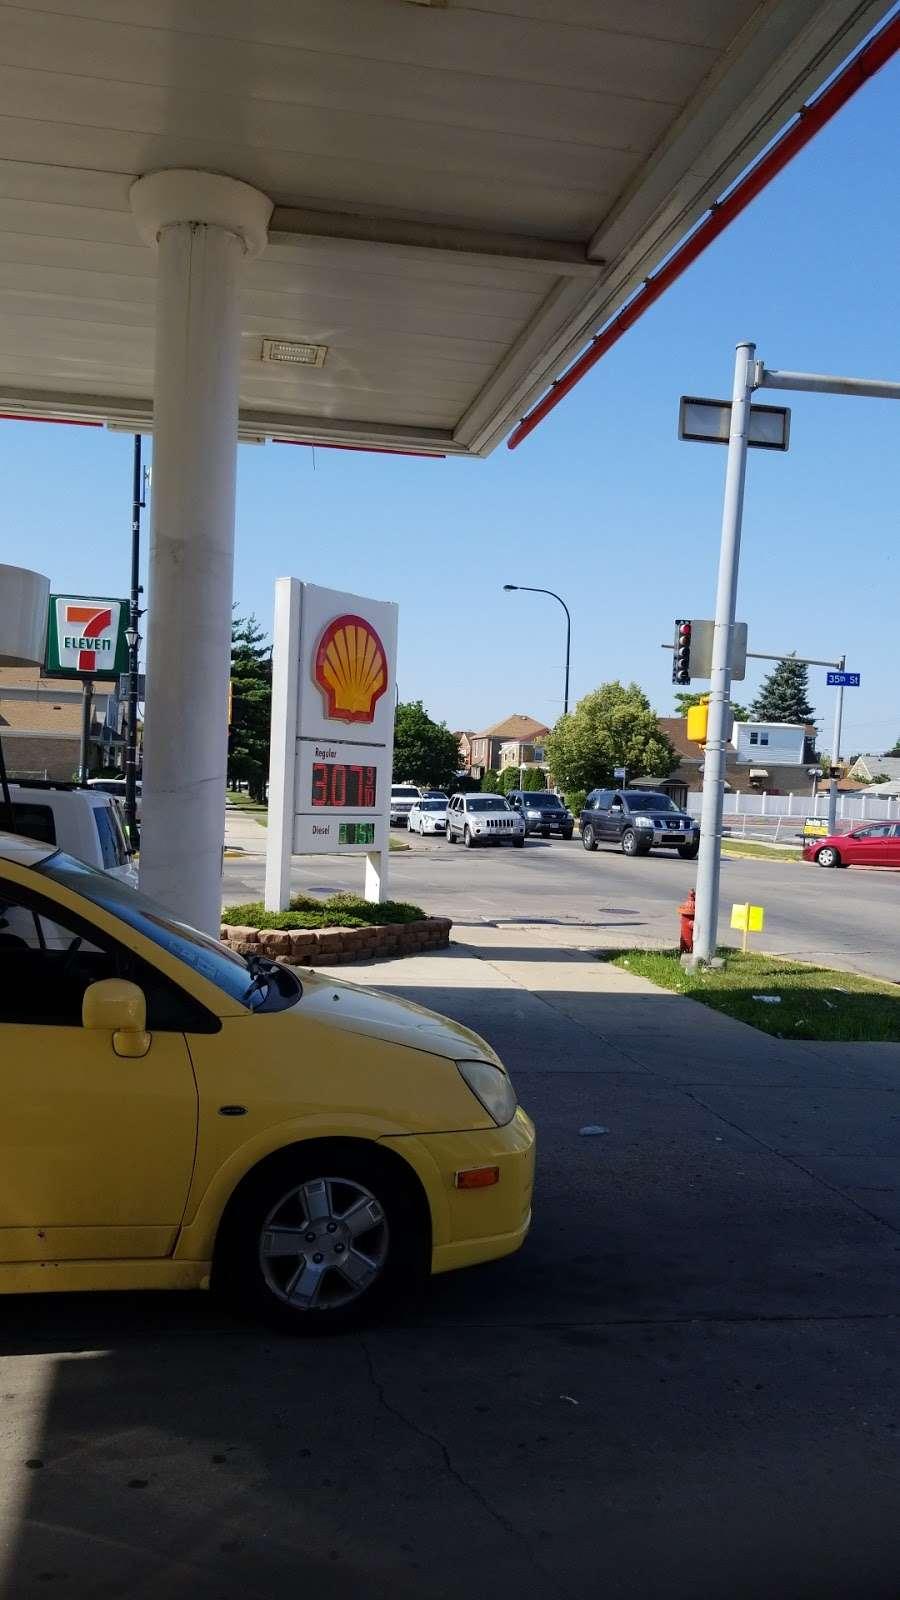 Shell - gas station  | Photo 1 of 2 | Address: 6001 W 35th St, Cicero, IL 60804, USA | Phone: (708) 477-4467